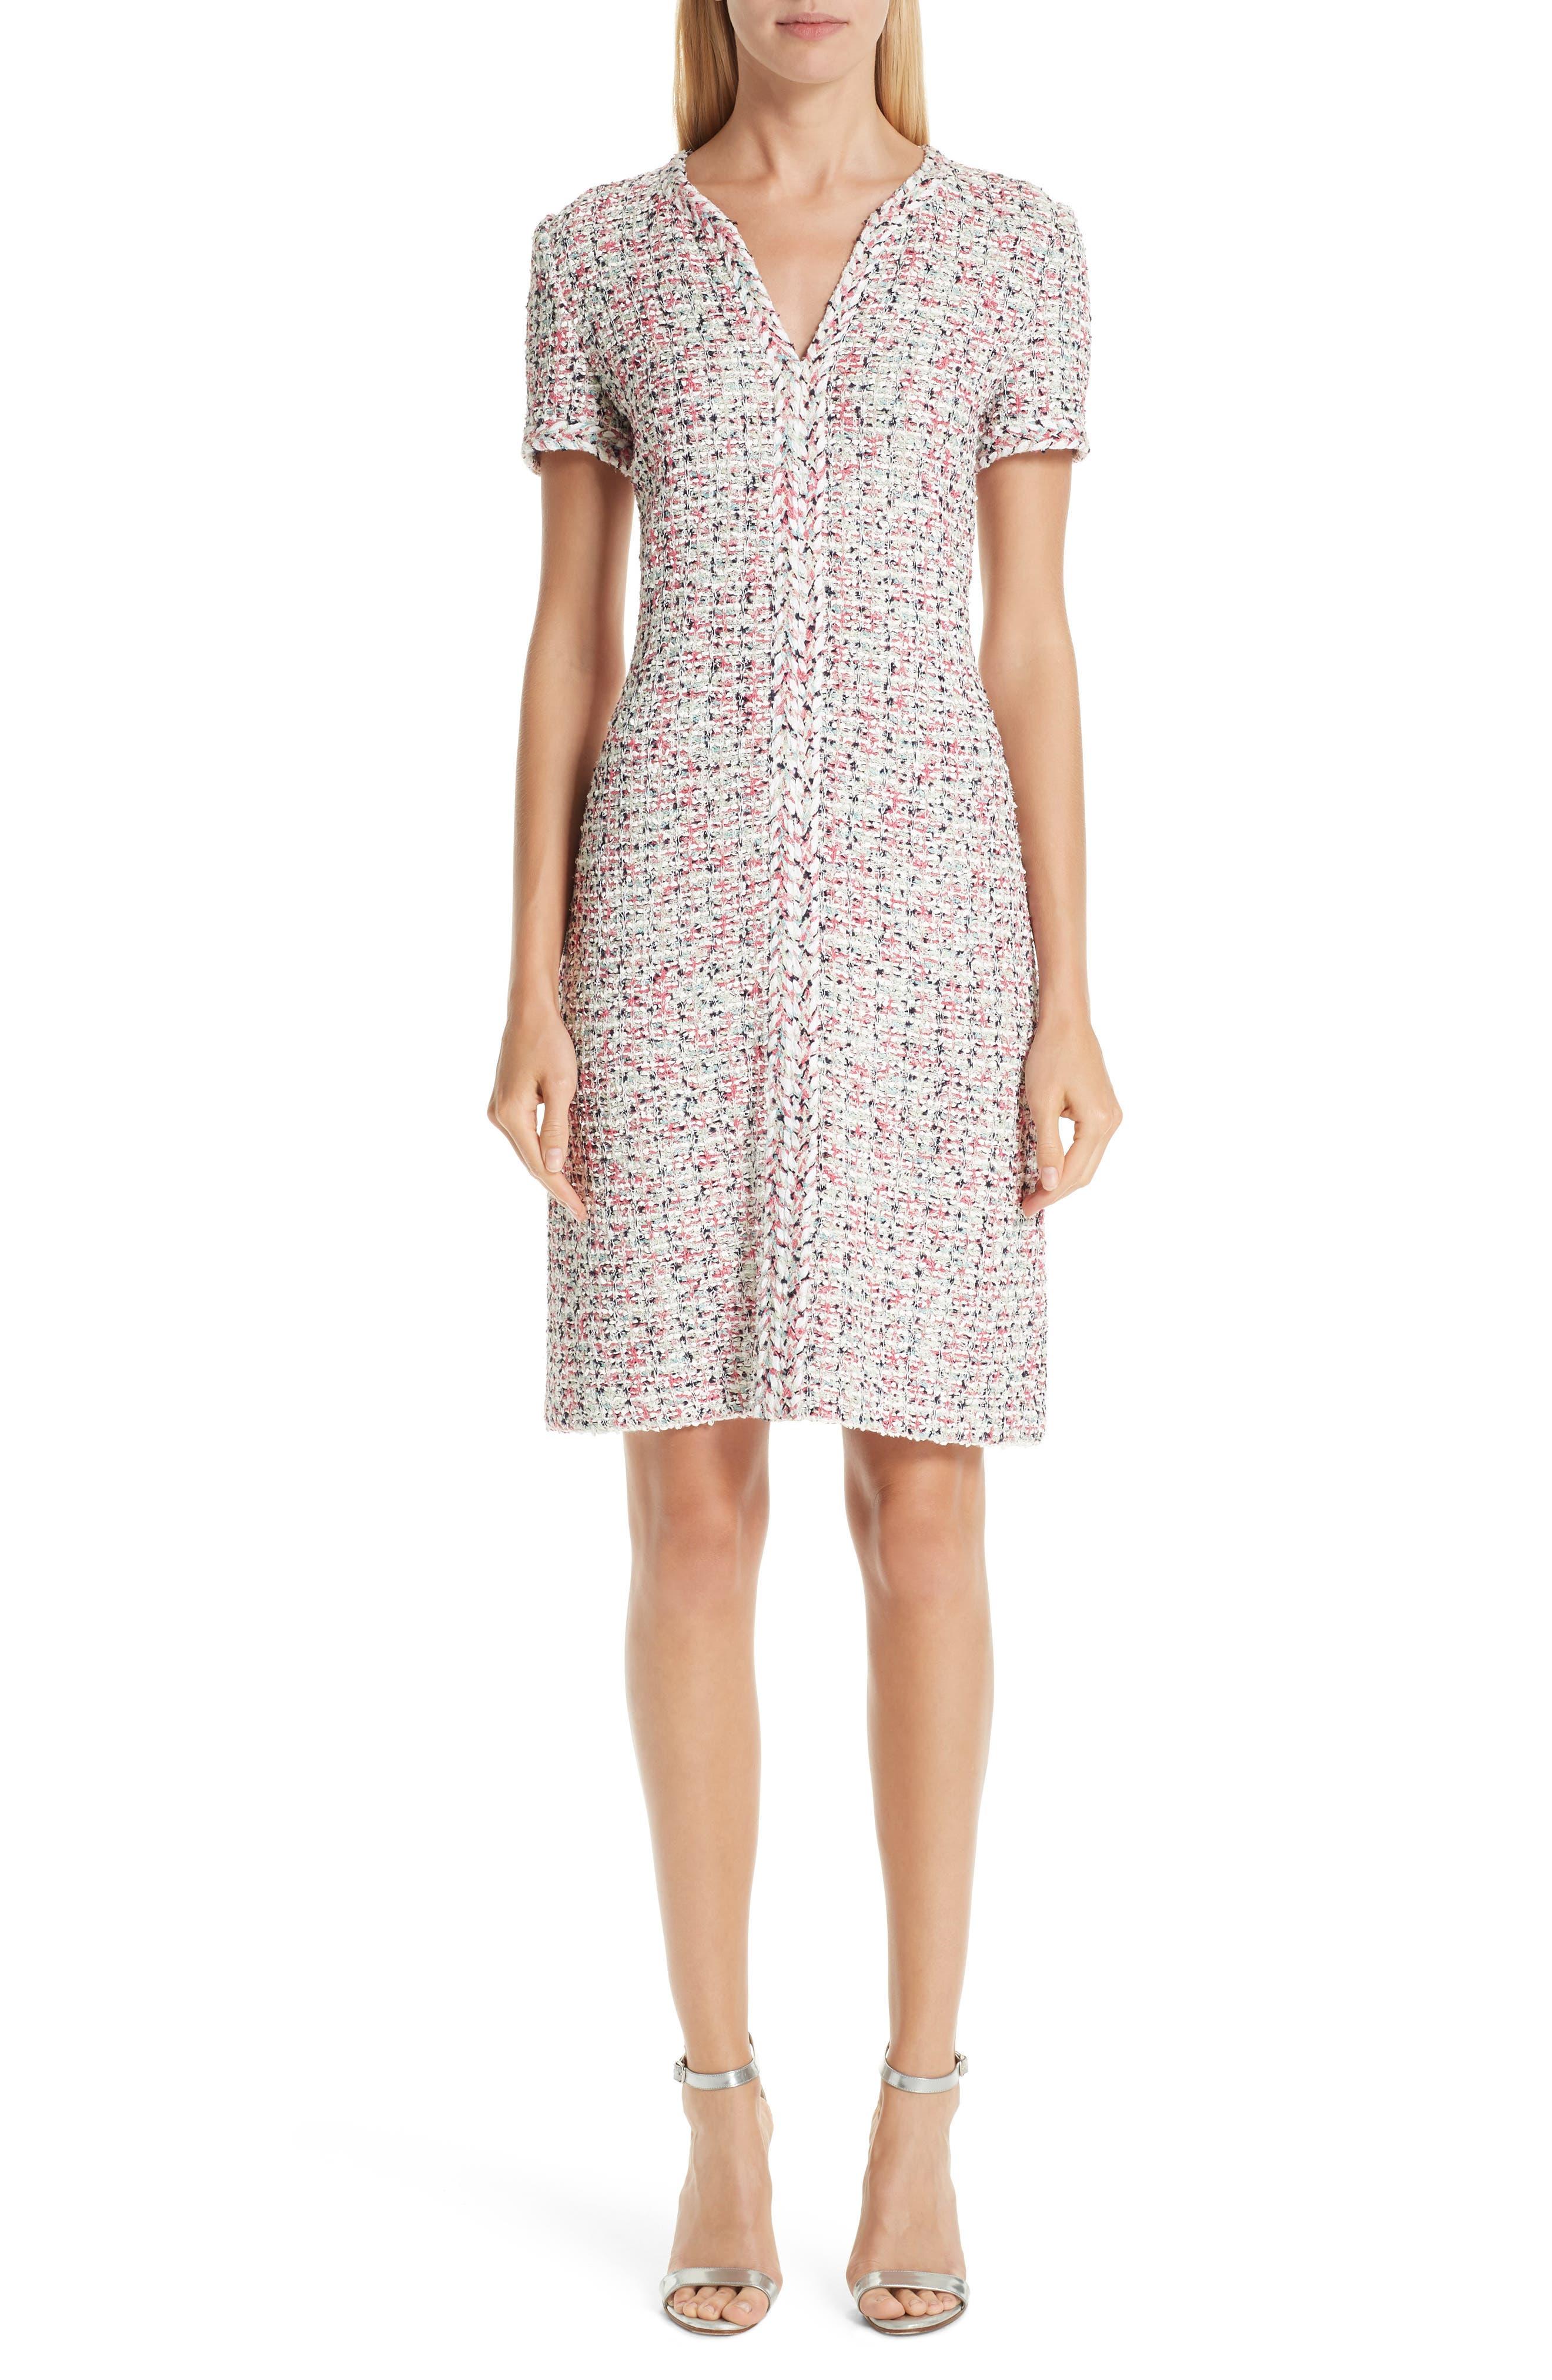 ST. JOHN COLLECTION, Modern Knit Dress, Main thumbnail 1, color, CREAM MULTI